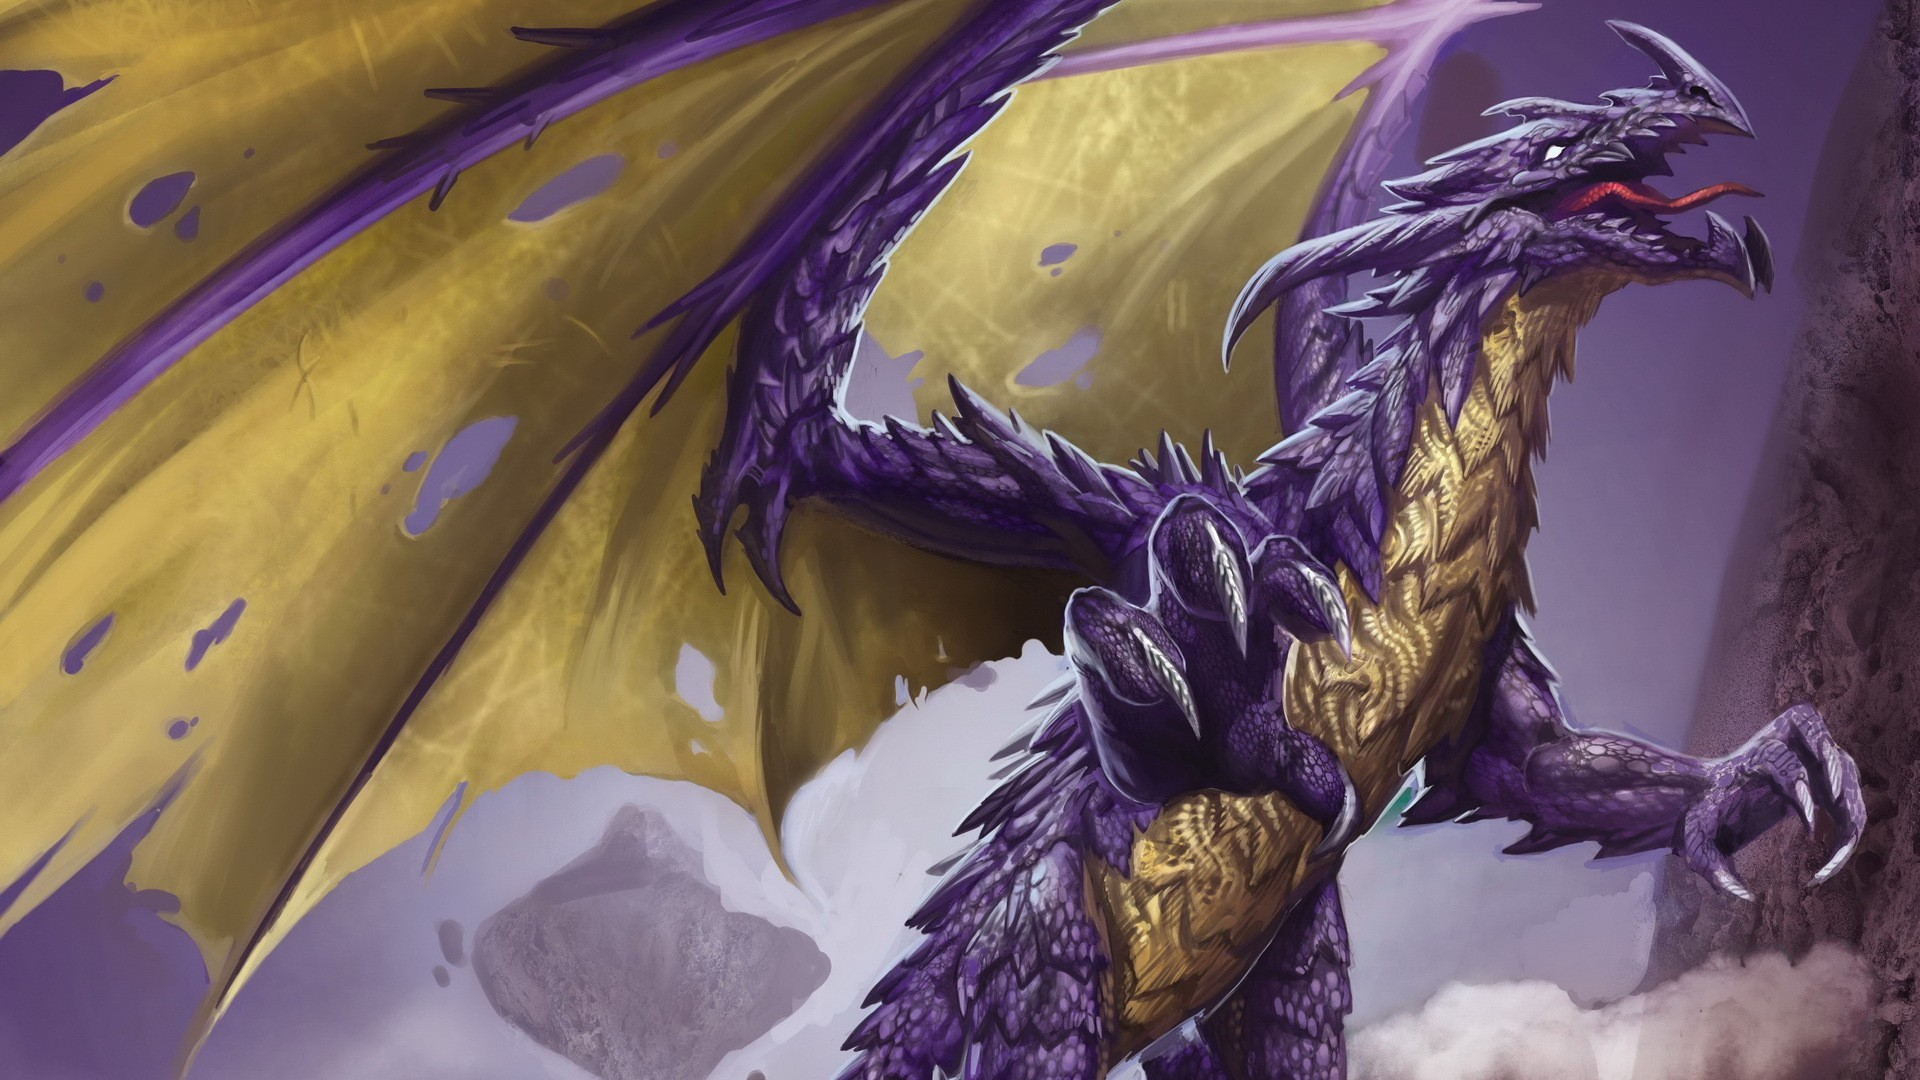 Res: 1920x1080, Purple Dragon wallpaper ForWallpapercom